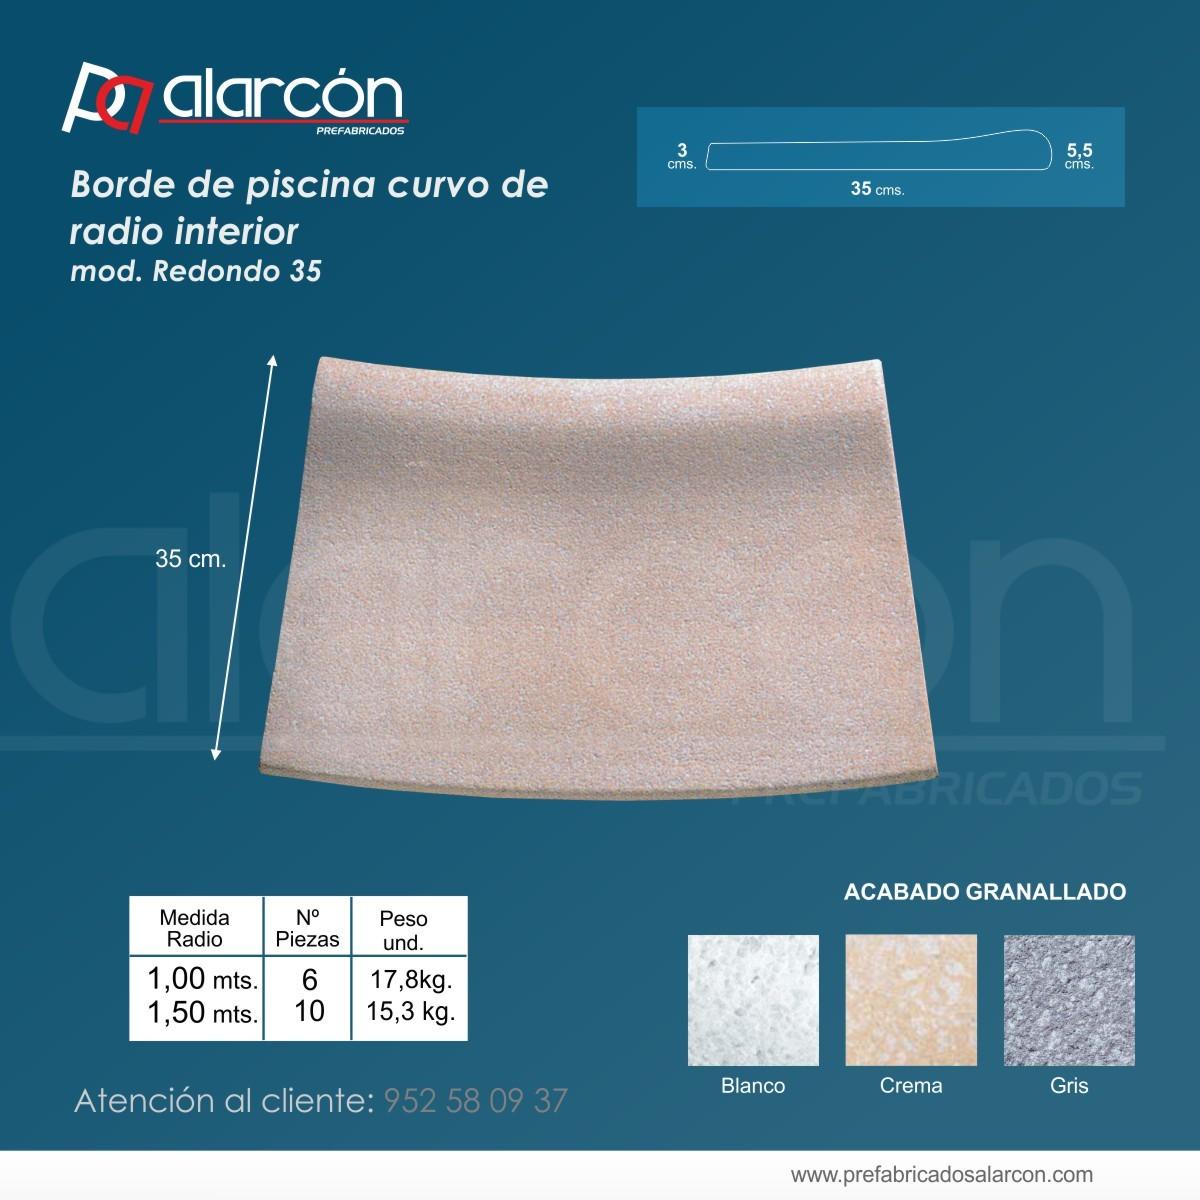 BORDE DE PISCINA CURVO RADIO INTERIOR. (modelo redondo 35)